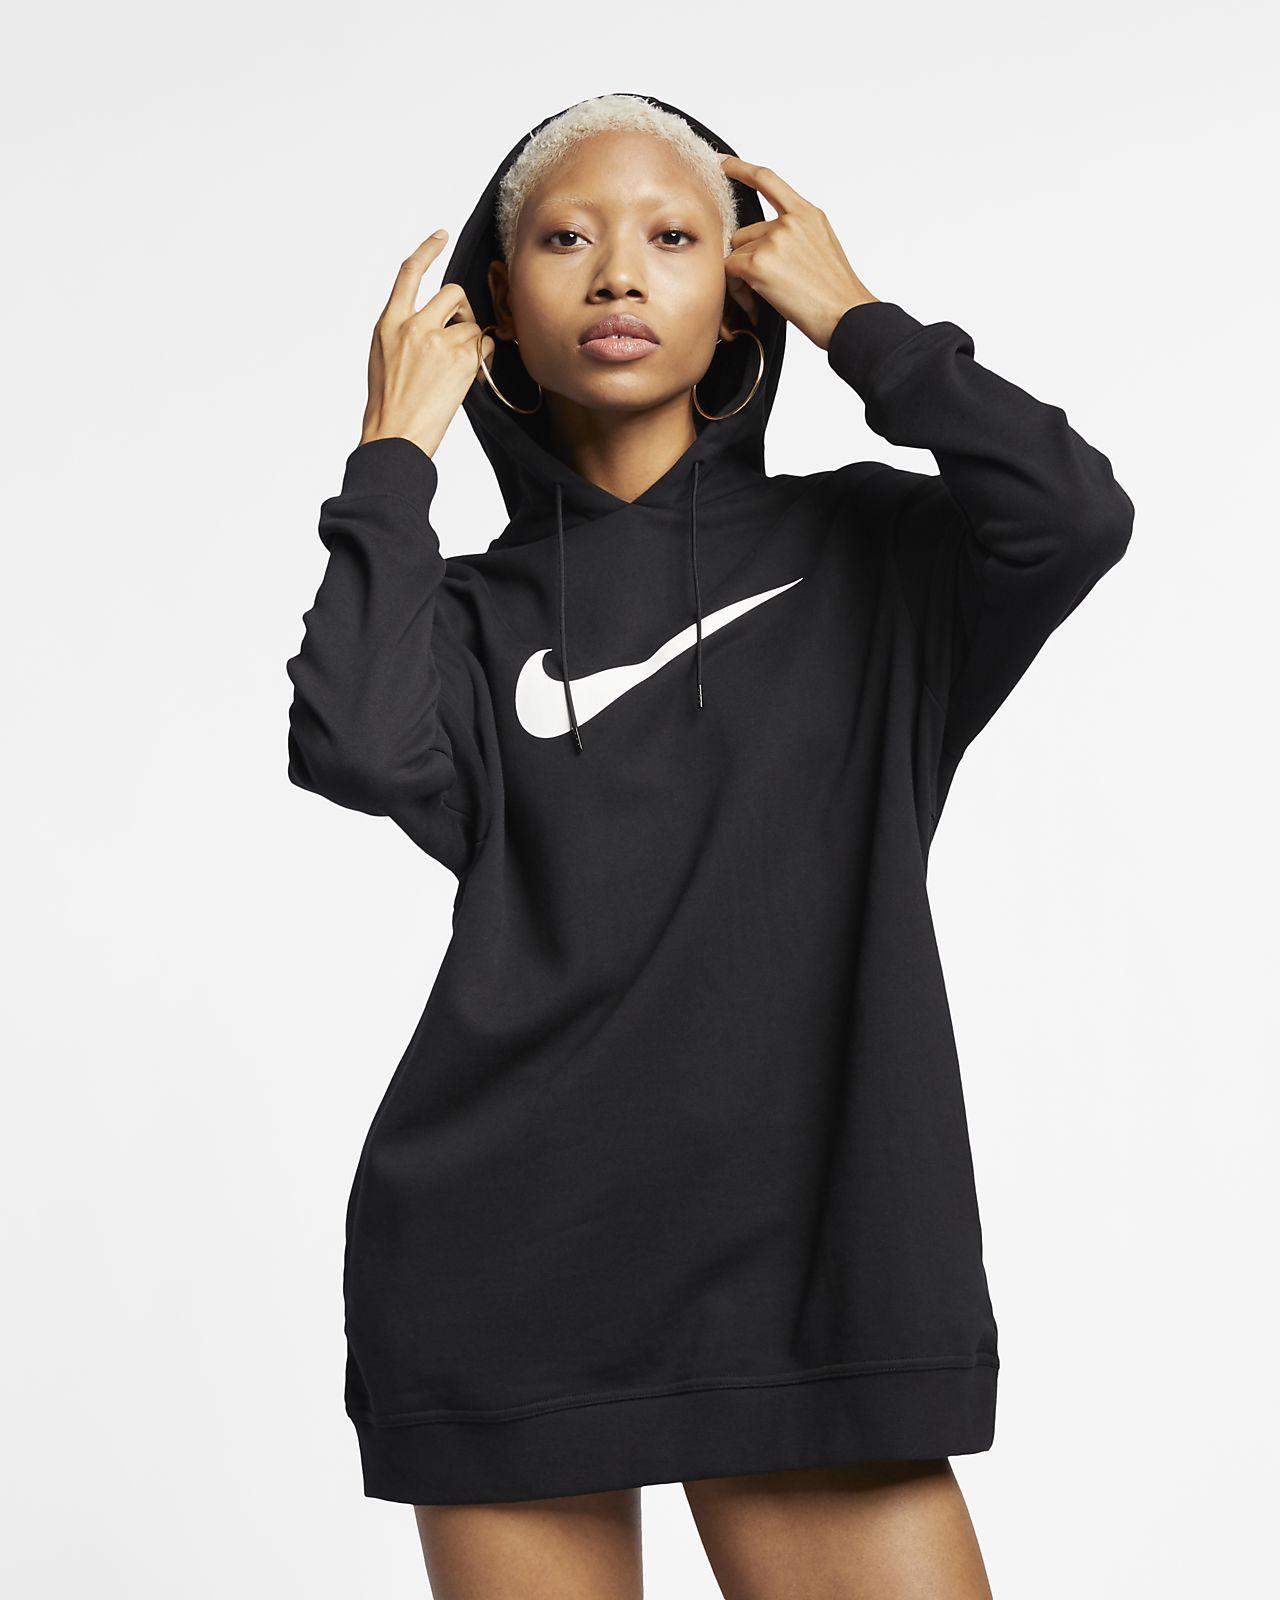 87c3098e7ea3 Nike Sportswear Swoosh Women s French Terry Hoodie. Nike.com